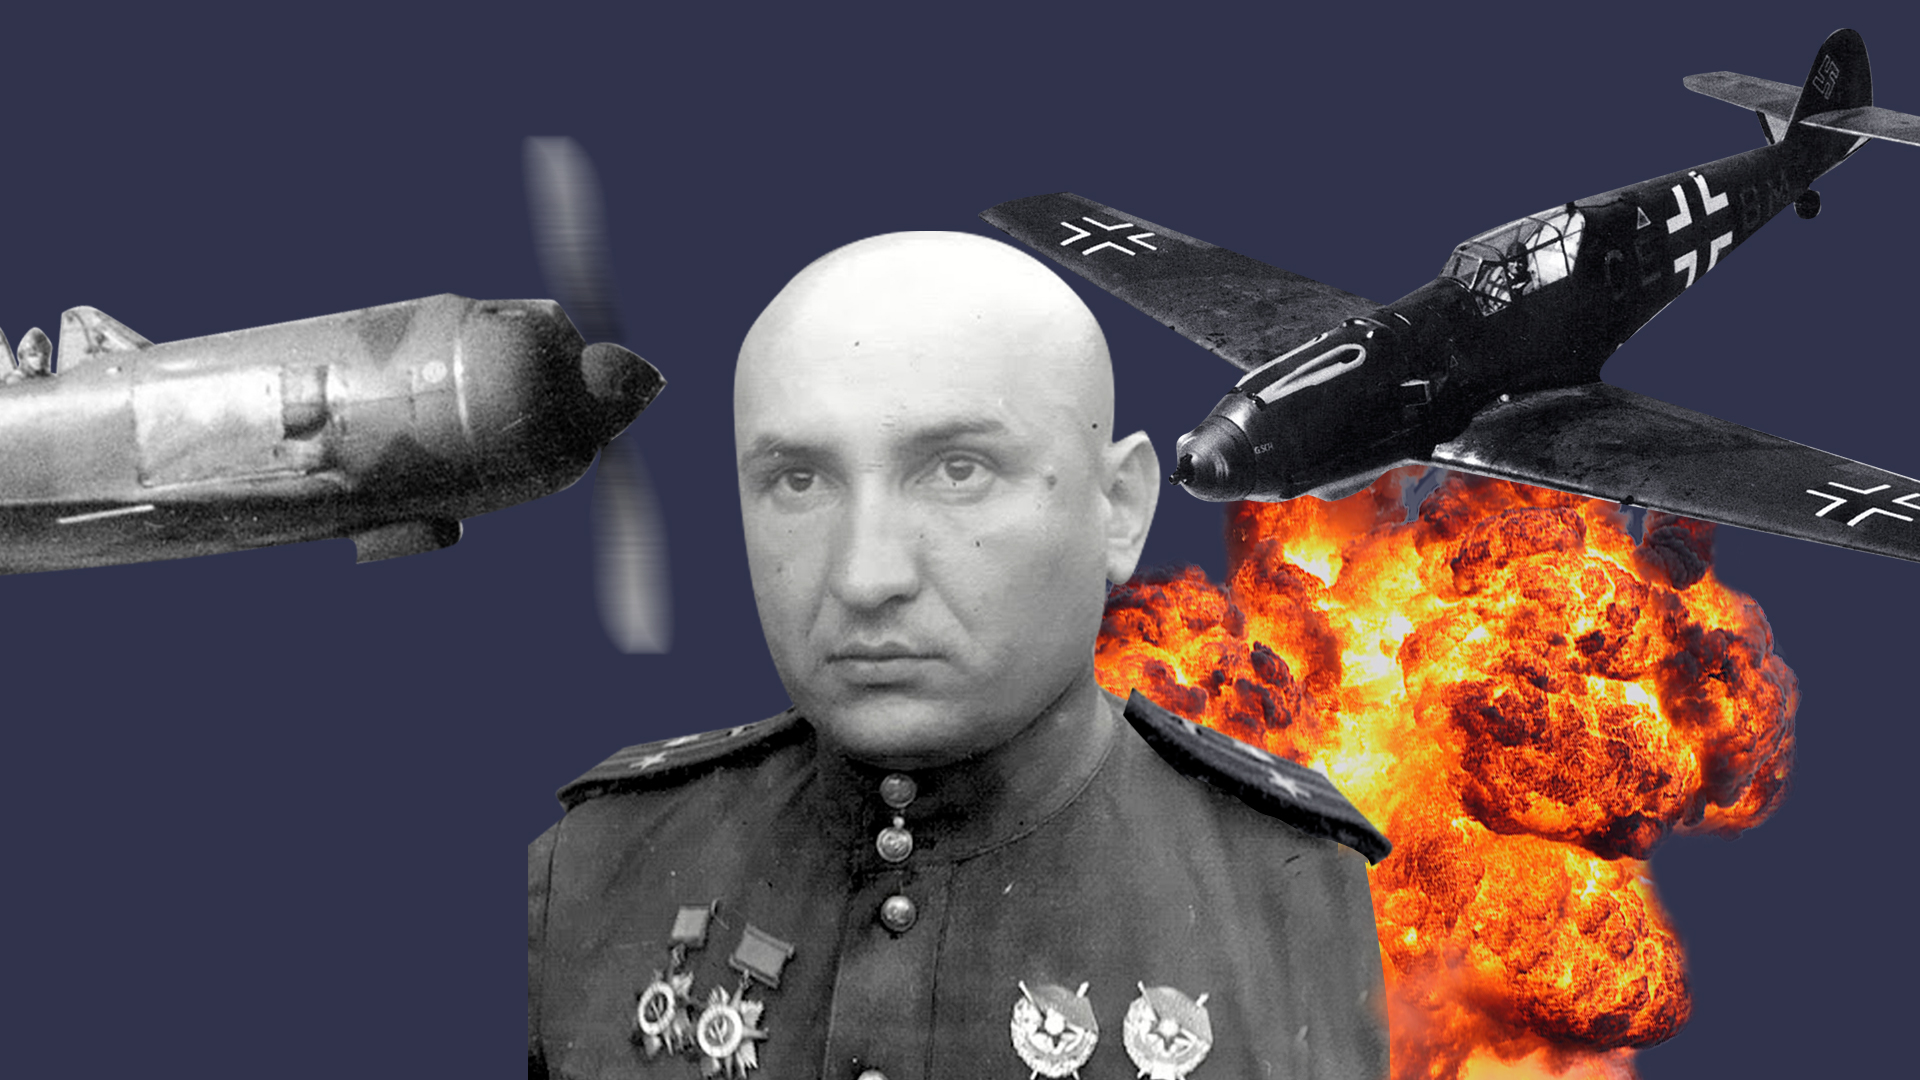 "<p>Коллаж © LIFE. Фото © <a href=""http://www.airwar.ru/enc/fww2/la5f.html"" target=""_blank"" rel=""noopener noreferrer"">airwar.ru</a>, © <a href=""https://en.wikipedia.org/wiki/Messerschmitt_Bf_109"" target=""_blank"" rel=""noopener noreferrer"">Wikipedia</a>, © <a href=""http://soviet-aces-1936-53.ru/abc/v/varchuk.htm"" target=""_blank"" rel=""noopener noreferrer"">Советские лётчики-асы. Герои воздушных войн 1936-</a><a href=""http://soviet-aces-1936-53.ru/abc/v/varchuk.htm"" target=""_blank"" rel=""noopener noreferrer"">1953 гг.</a></p>"